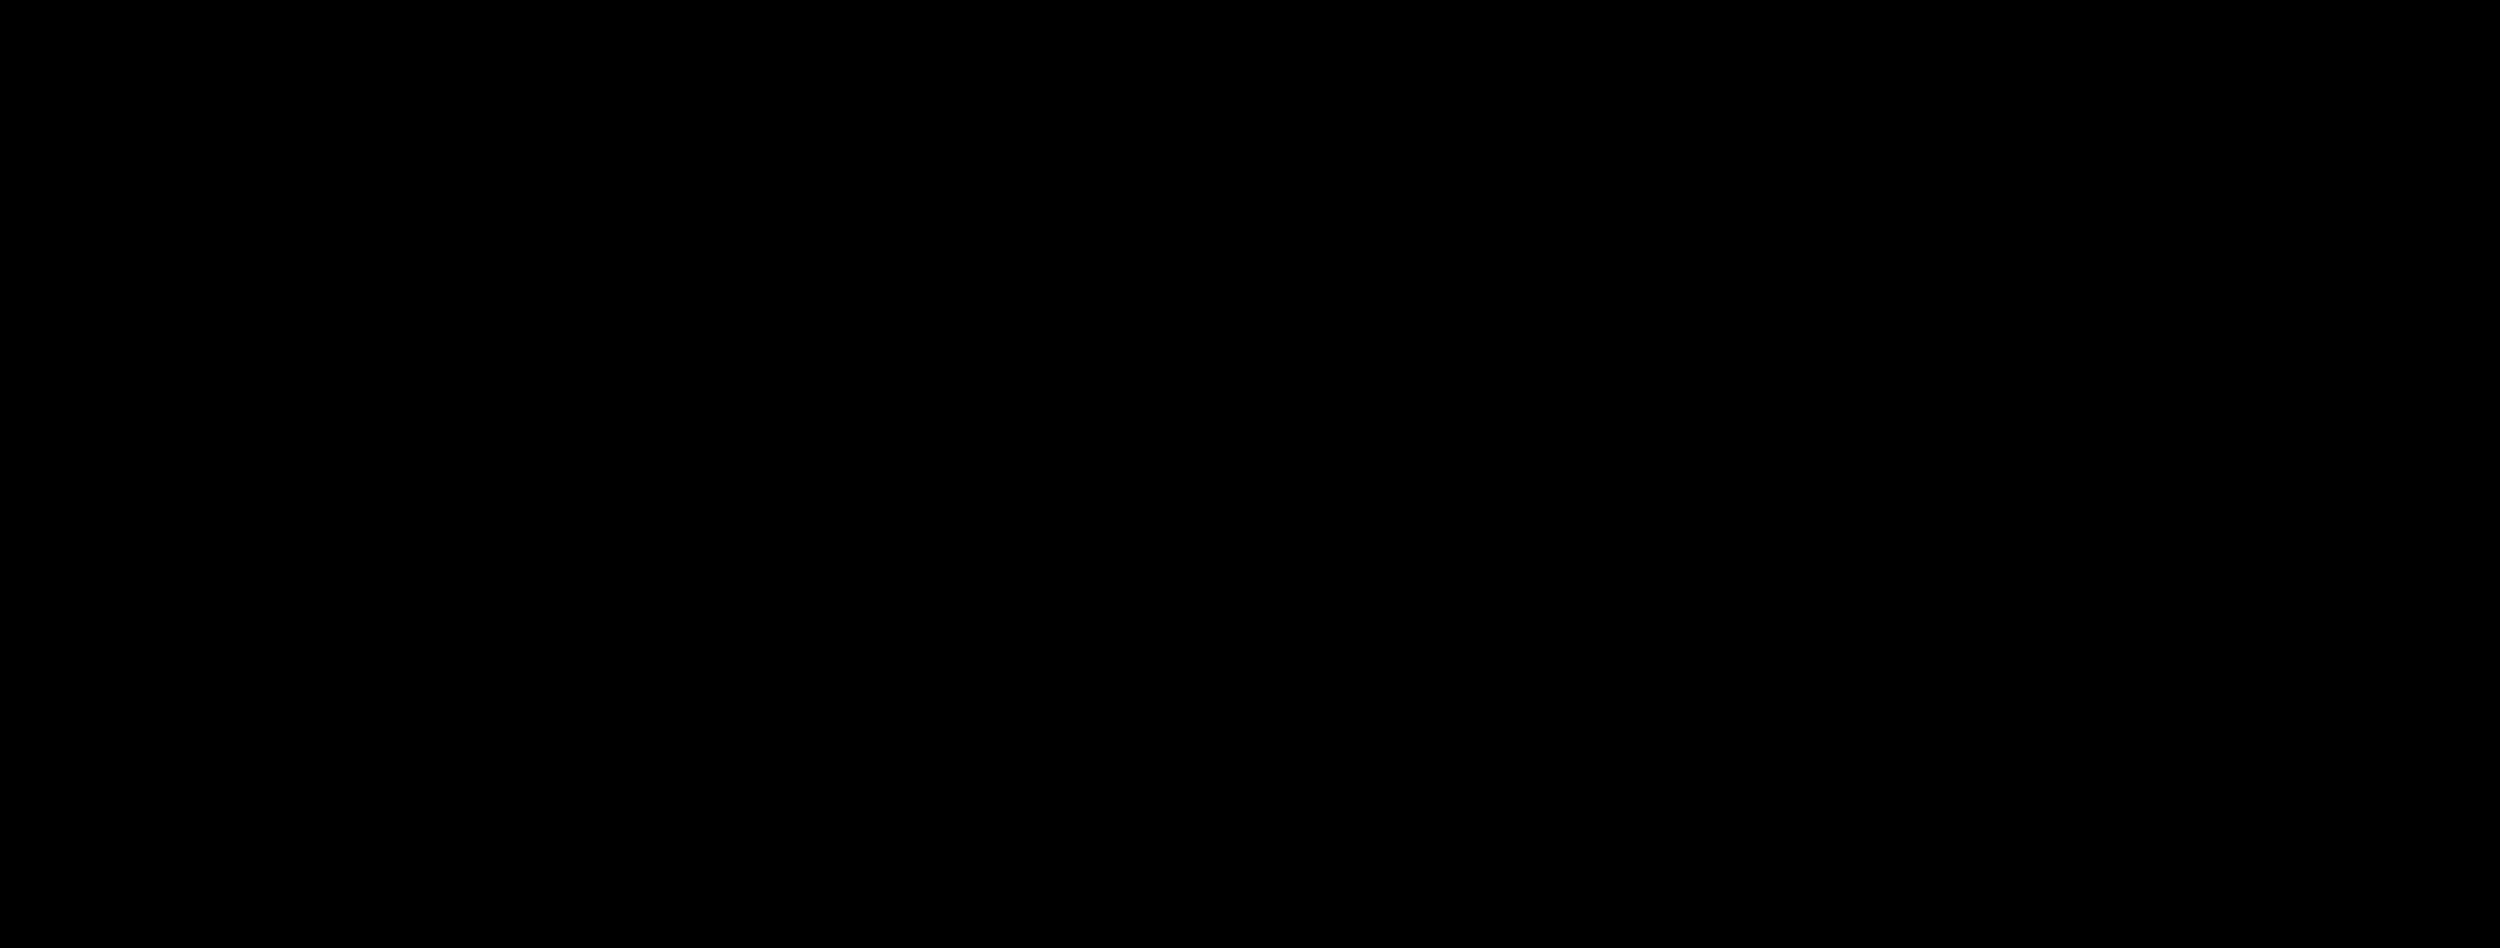 Robson_logo_black.png